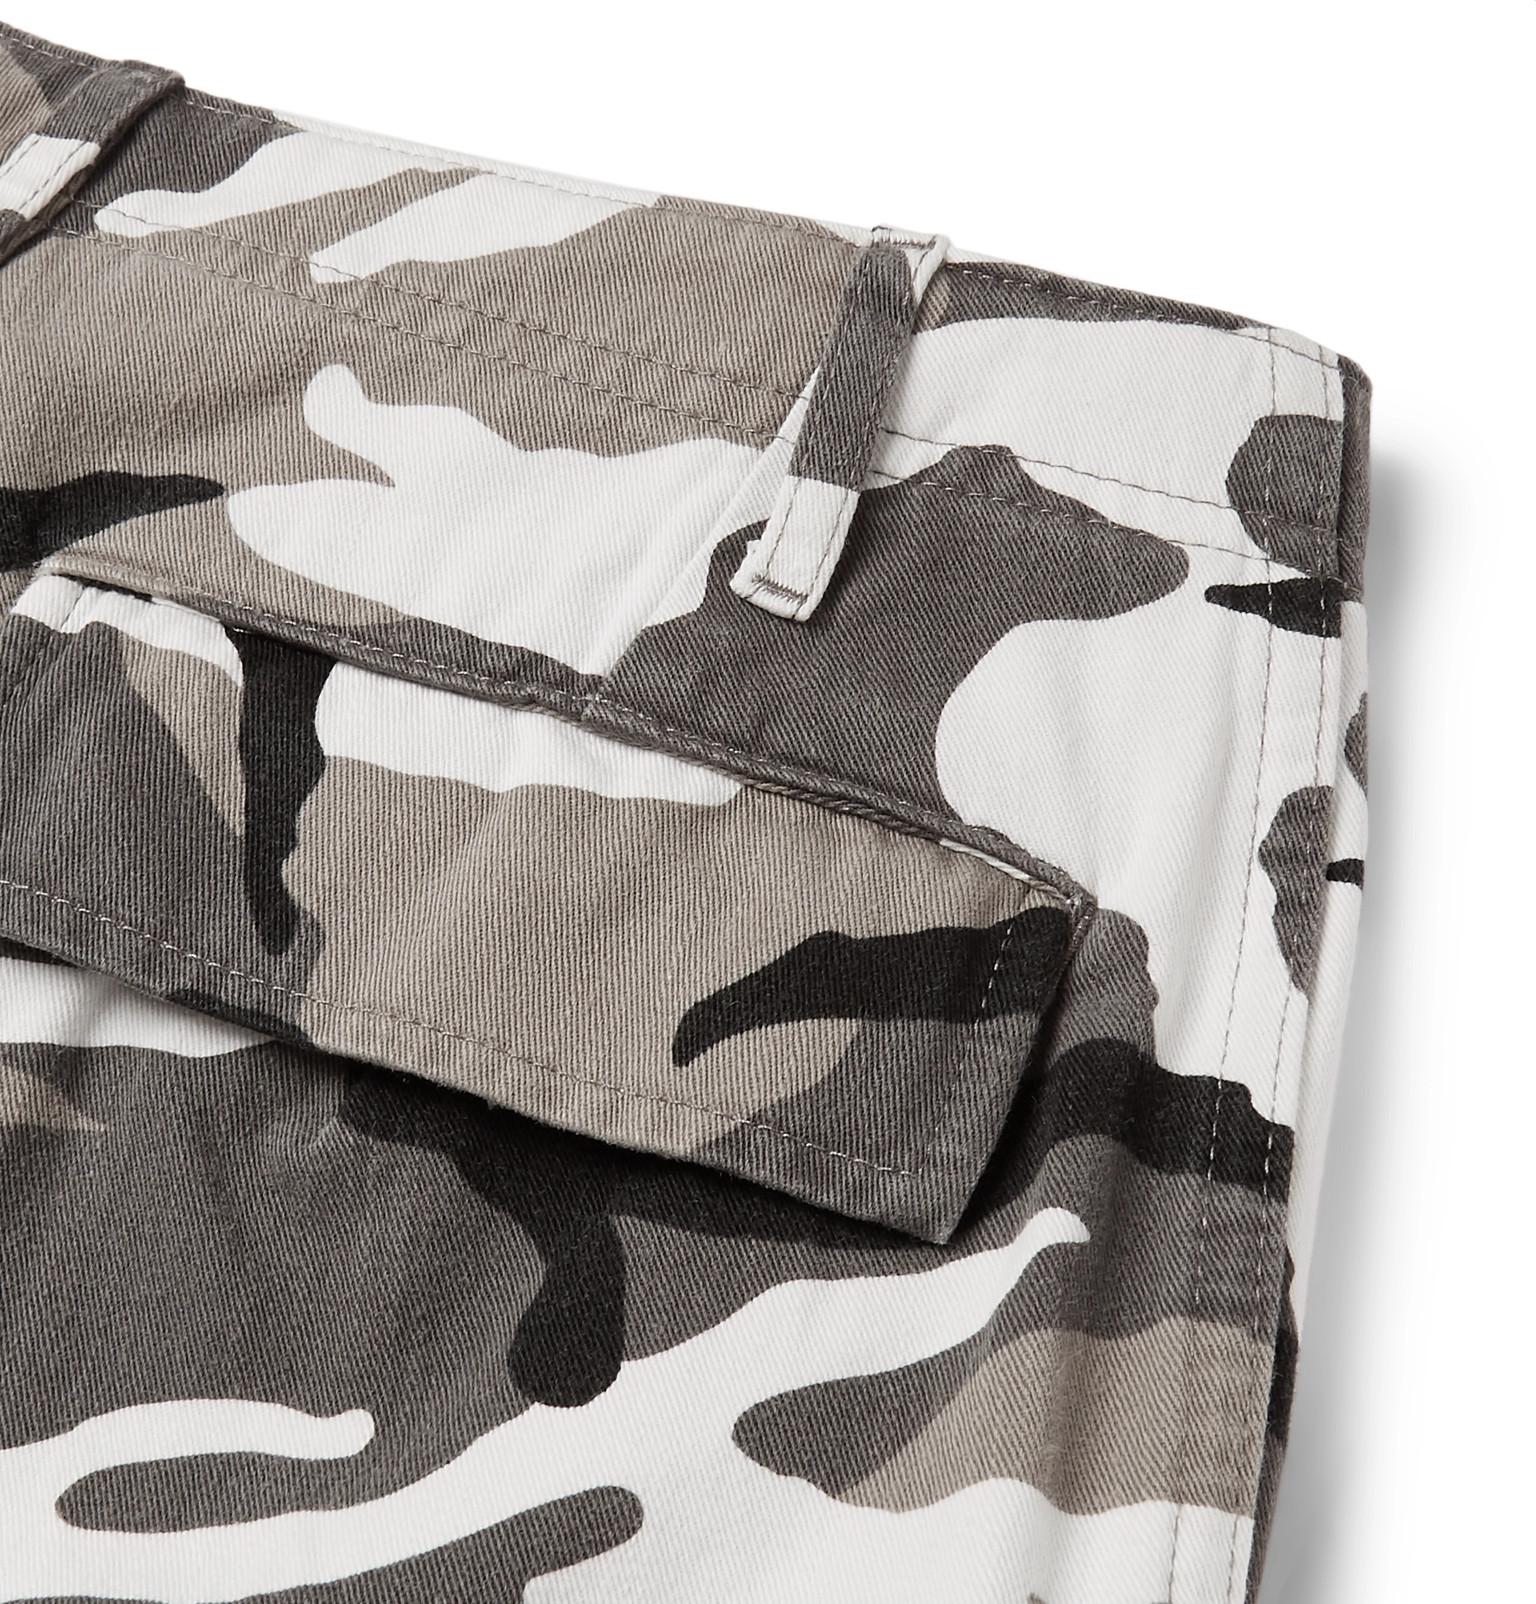 0c6d521d2b4c Balenciaga - Slim-Fit Camouflage-Print Cotton-Twill Cargo Trousers